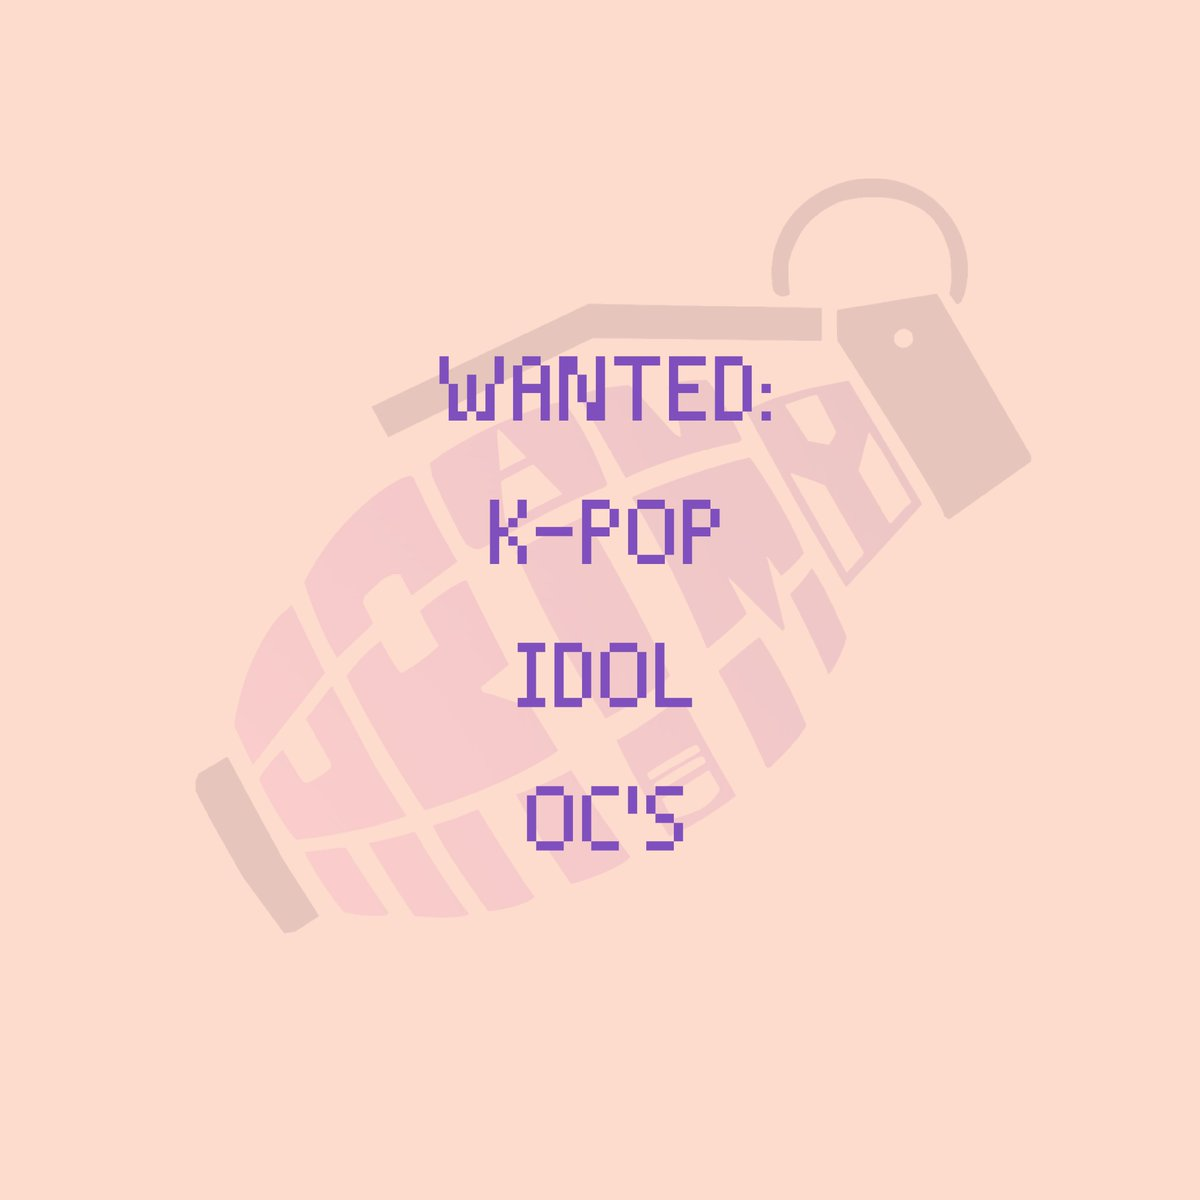 WANTED: KPOP IDOL OC'S